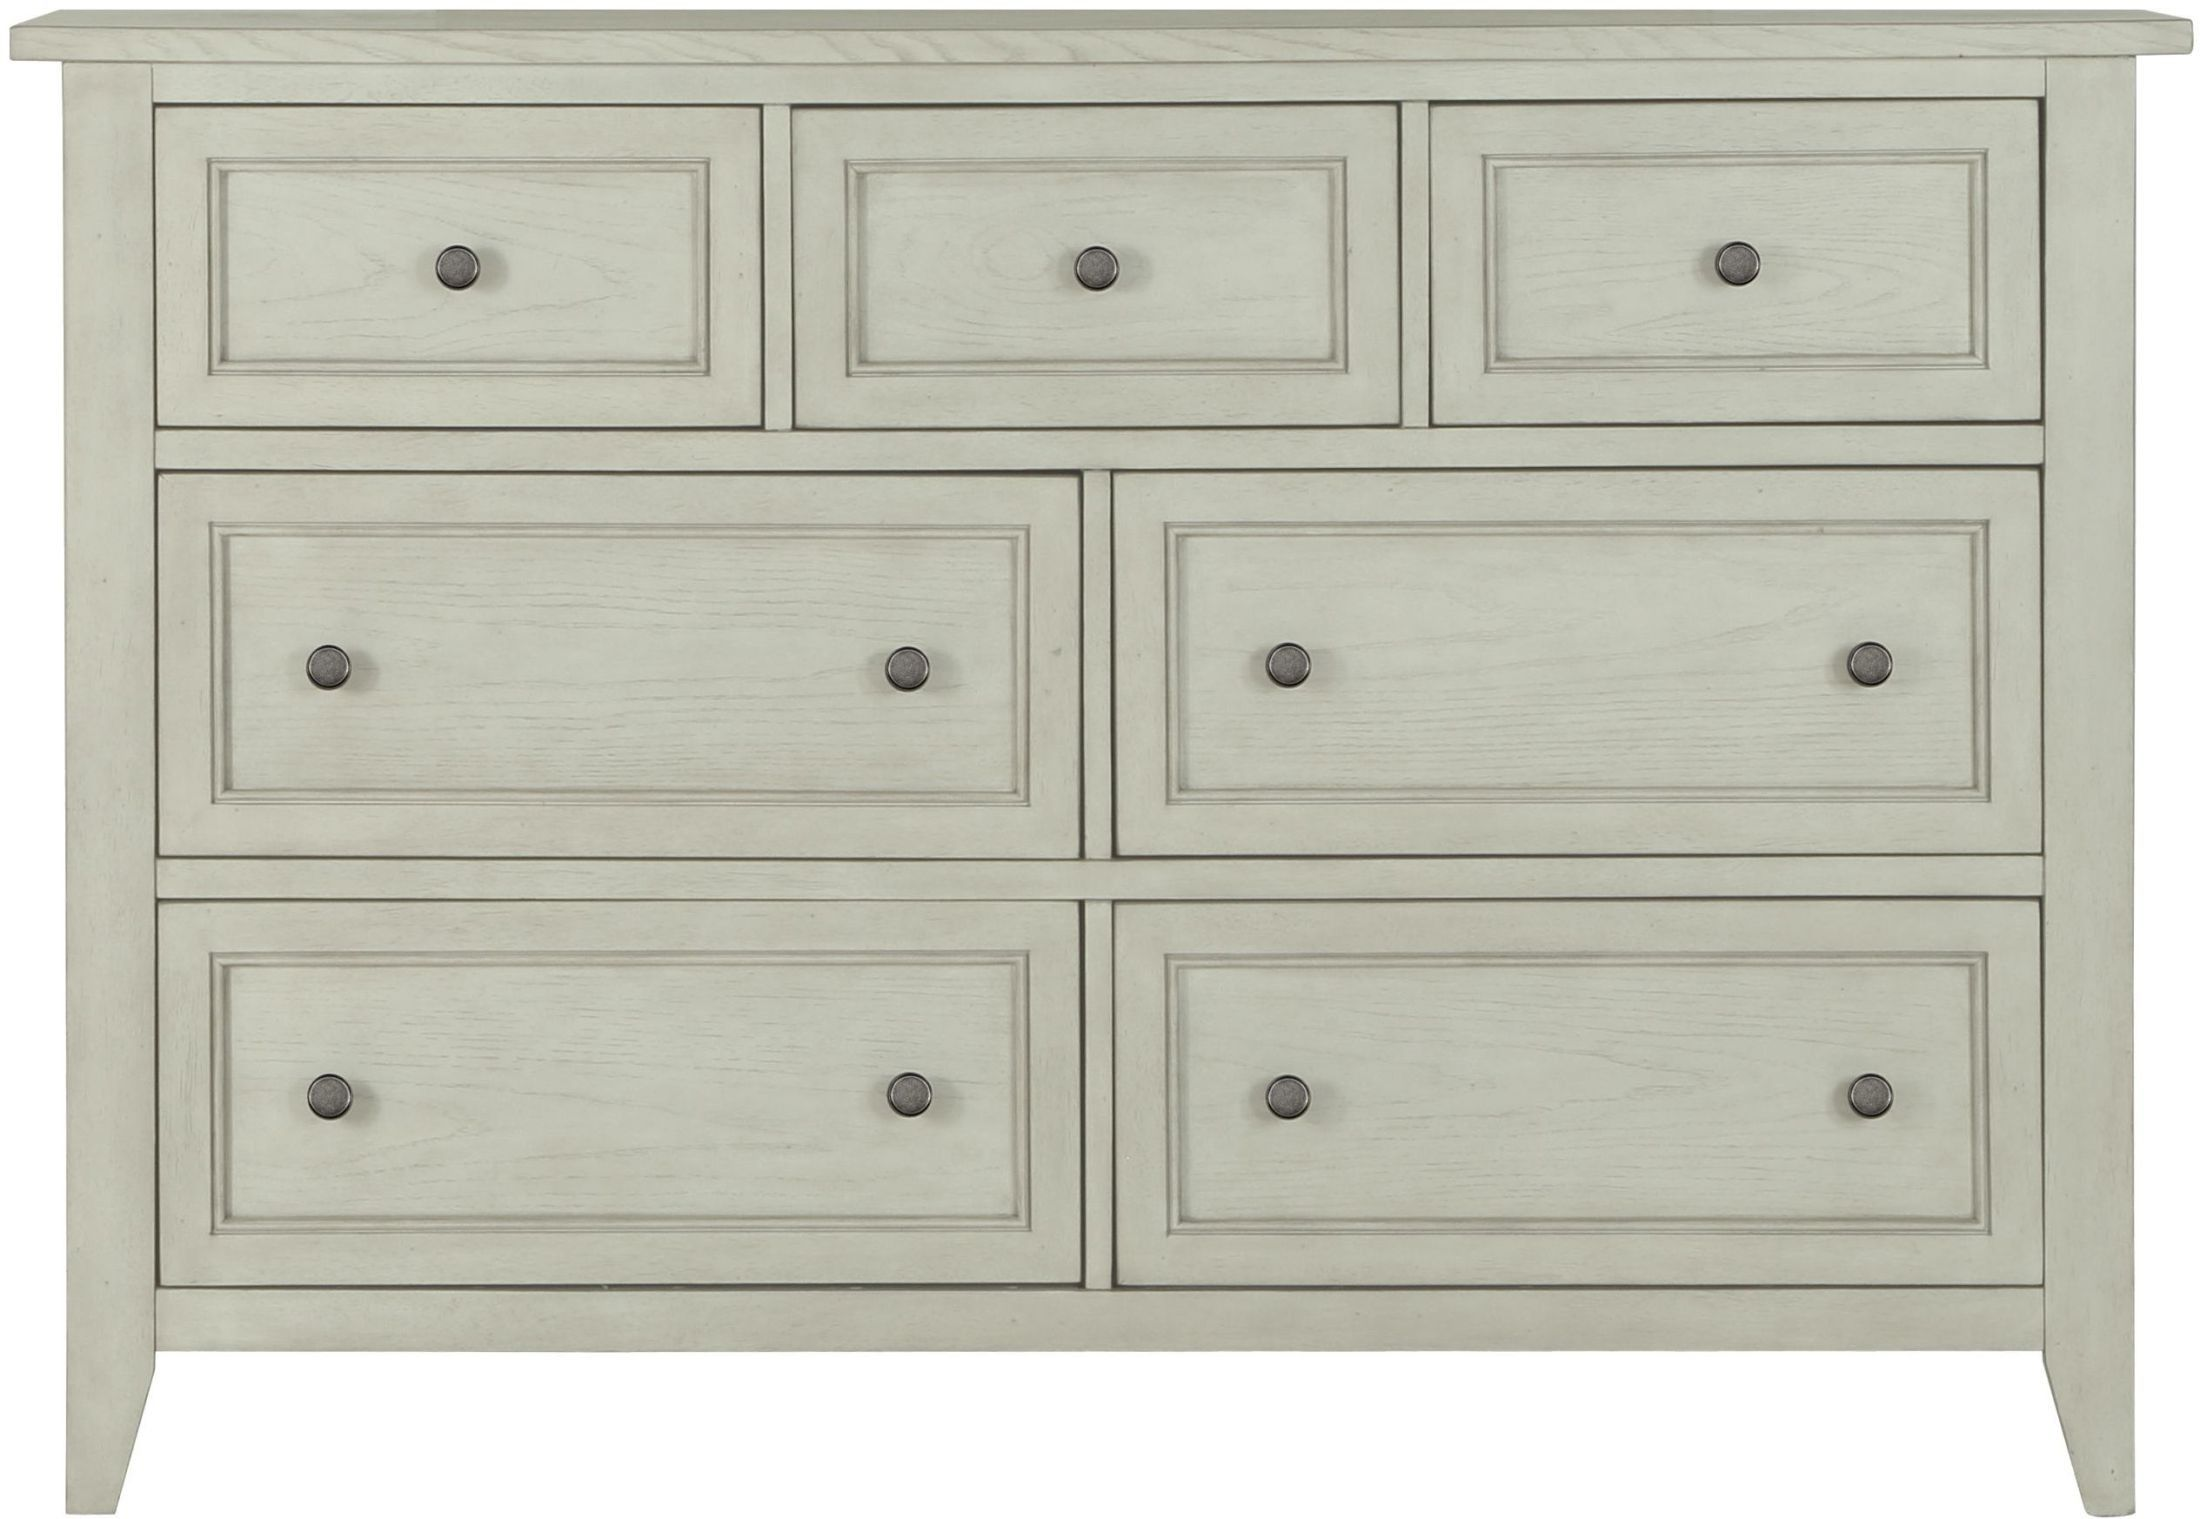 Raelynn Weathered White Drawer Dresser In 2021 Coaster Furniture Dresser Drawers Homemakers Furniture [ 1519 x 2200 Pixel ]